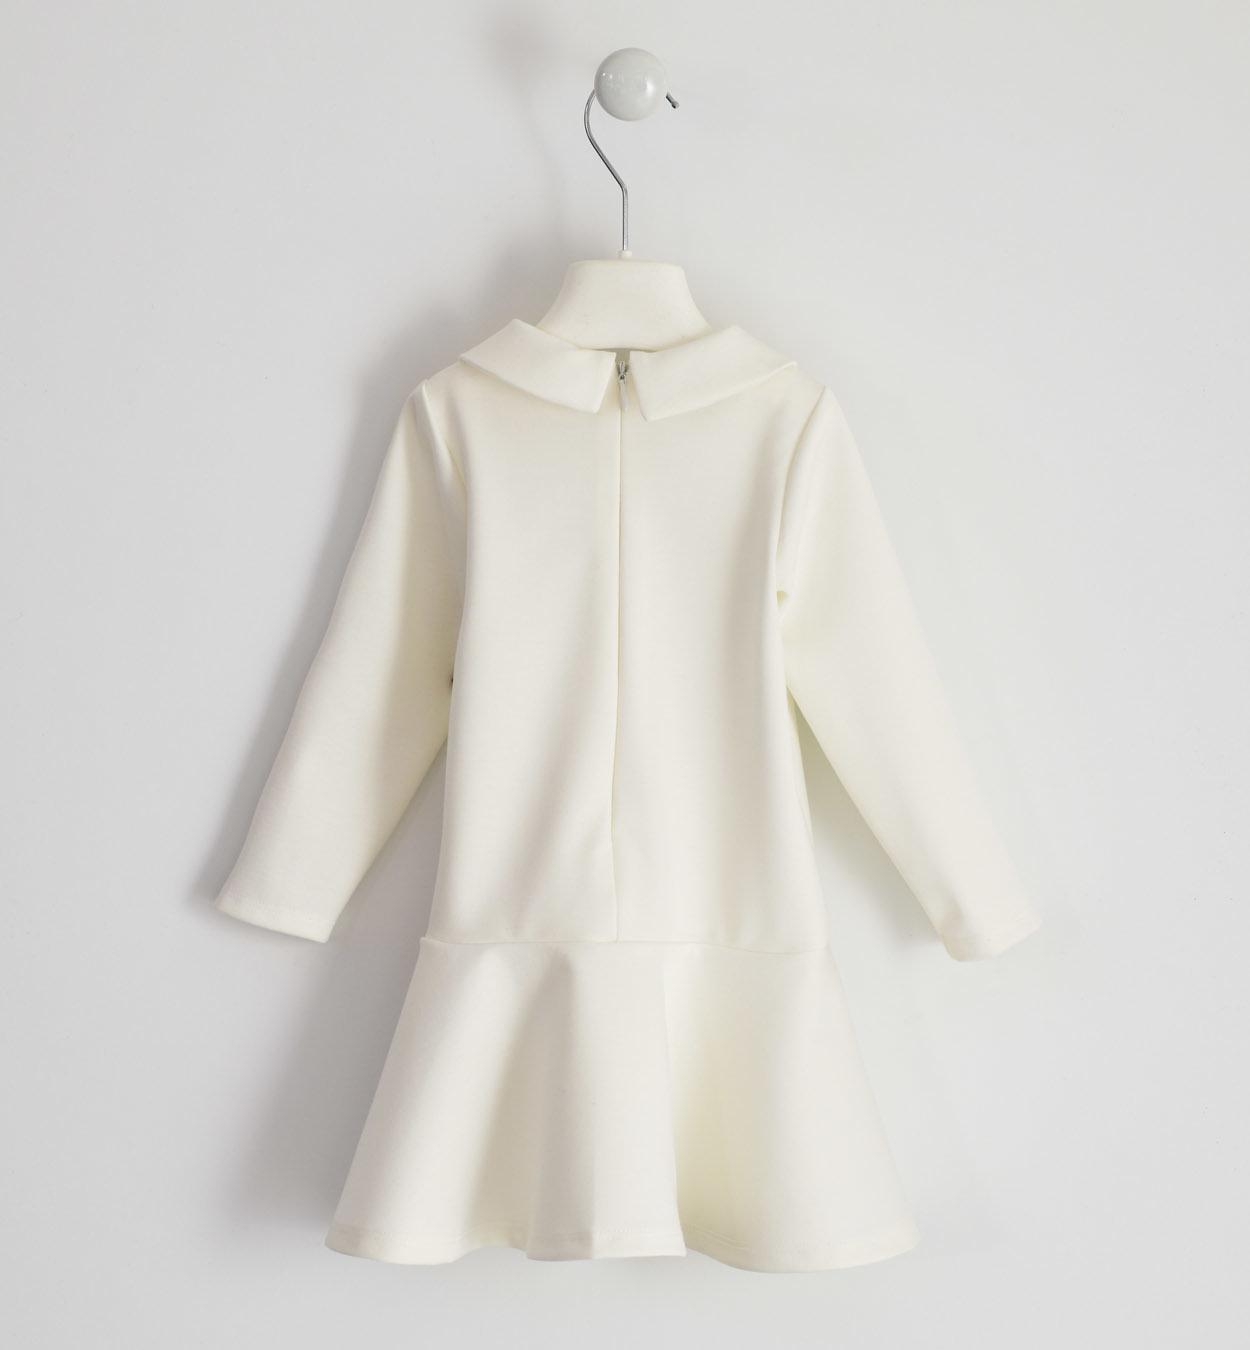 Ido Ido 1643 Winter White Dress with Crystal Heart Motif